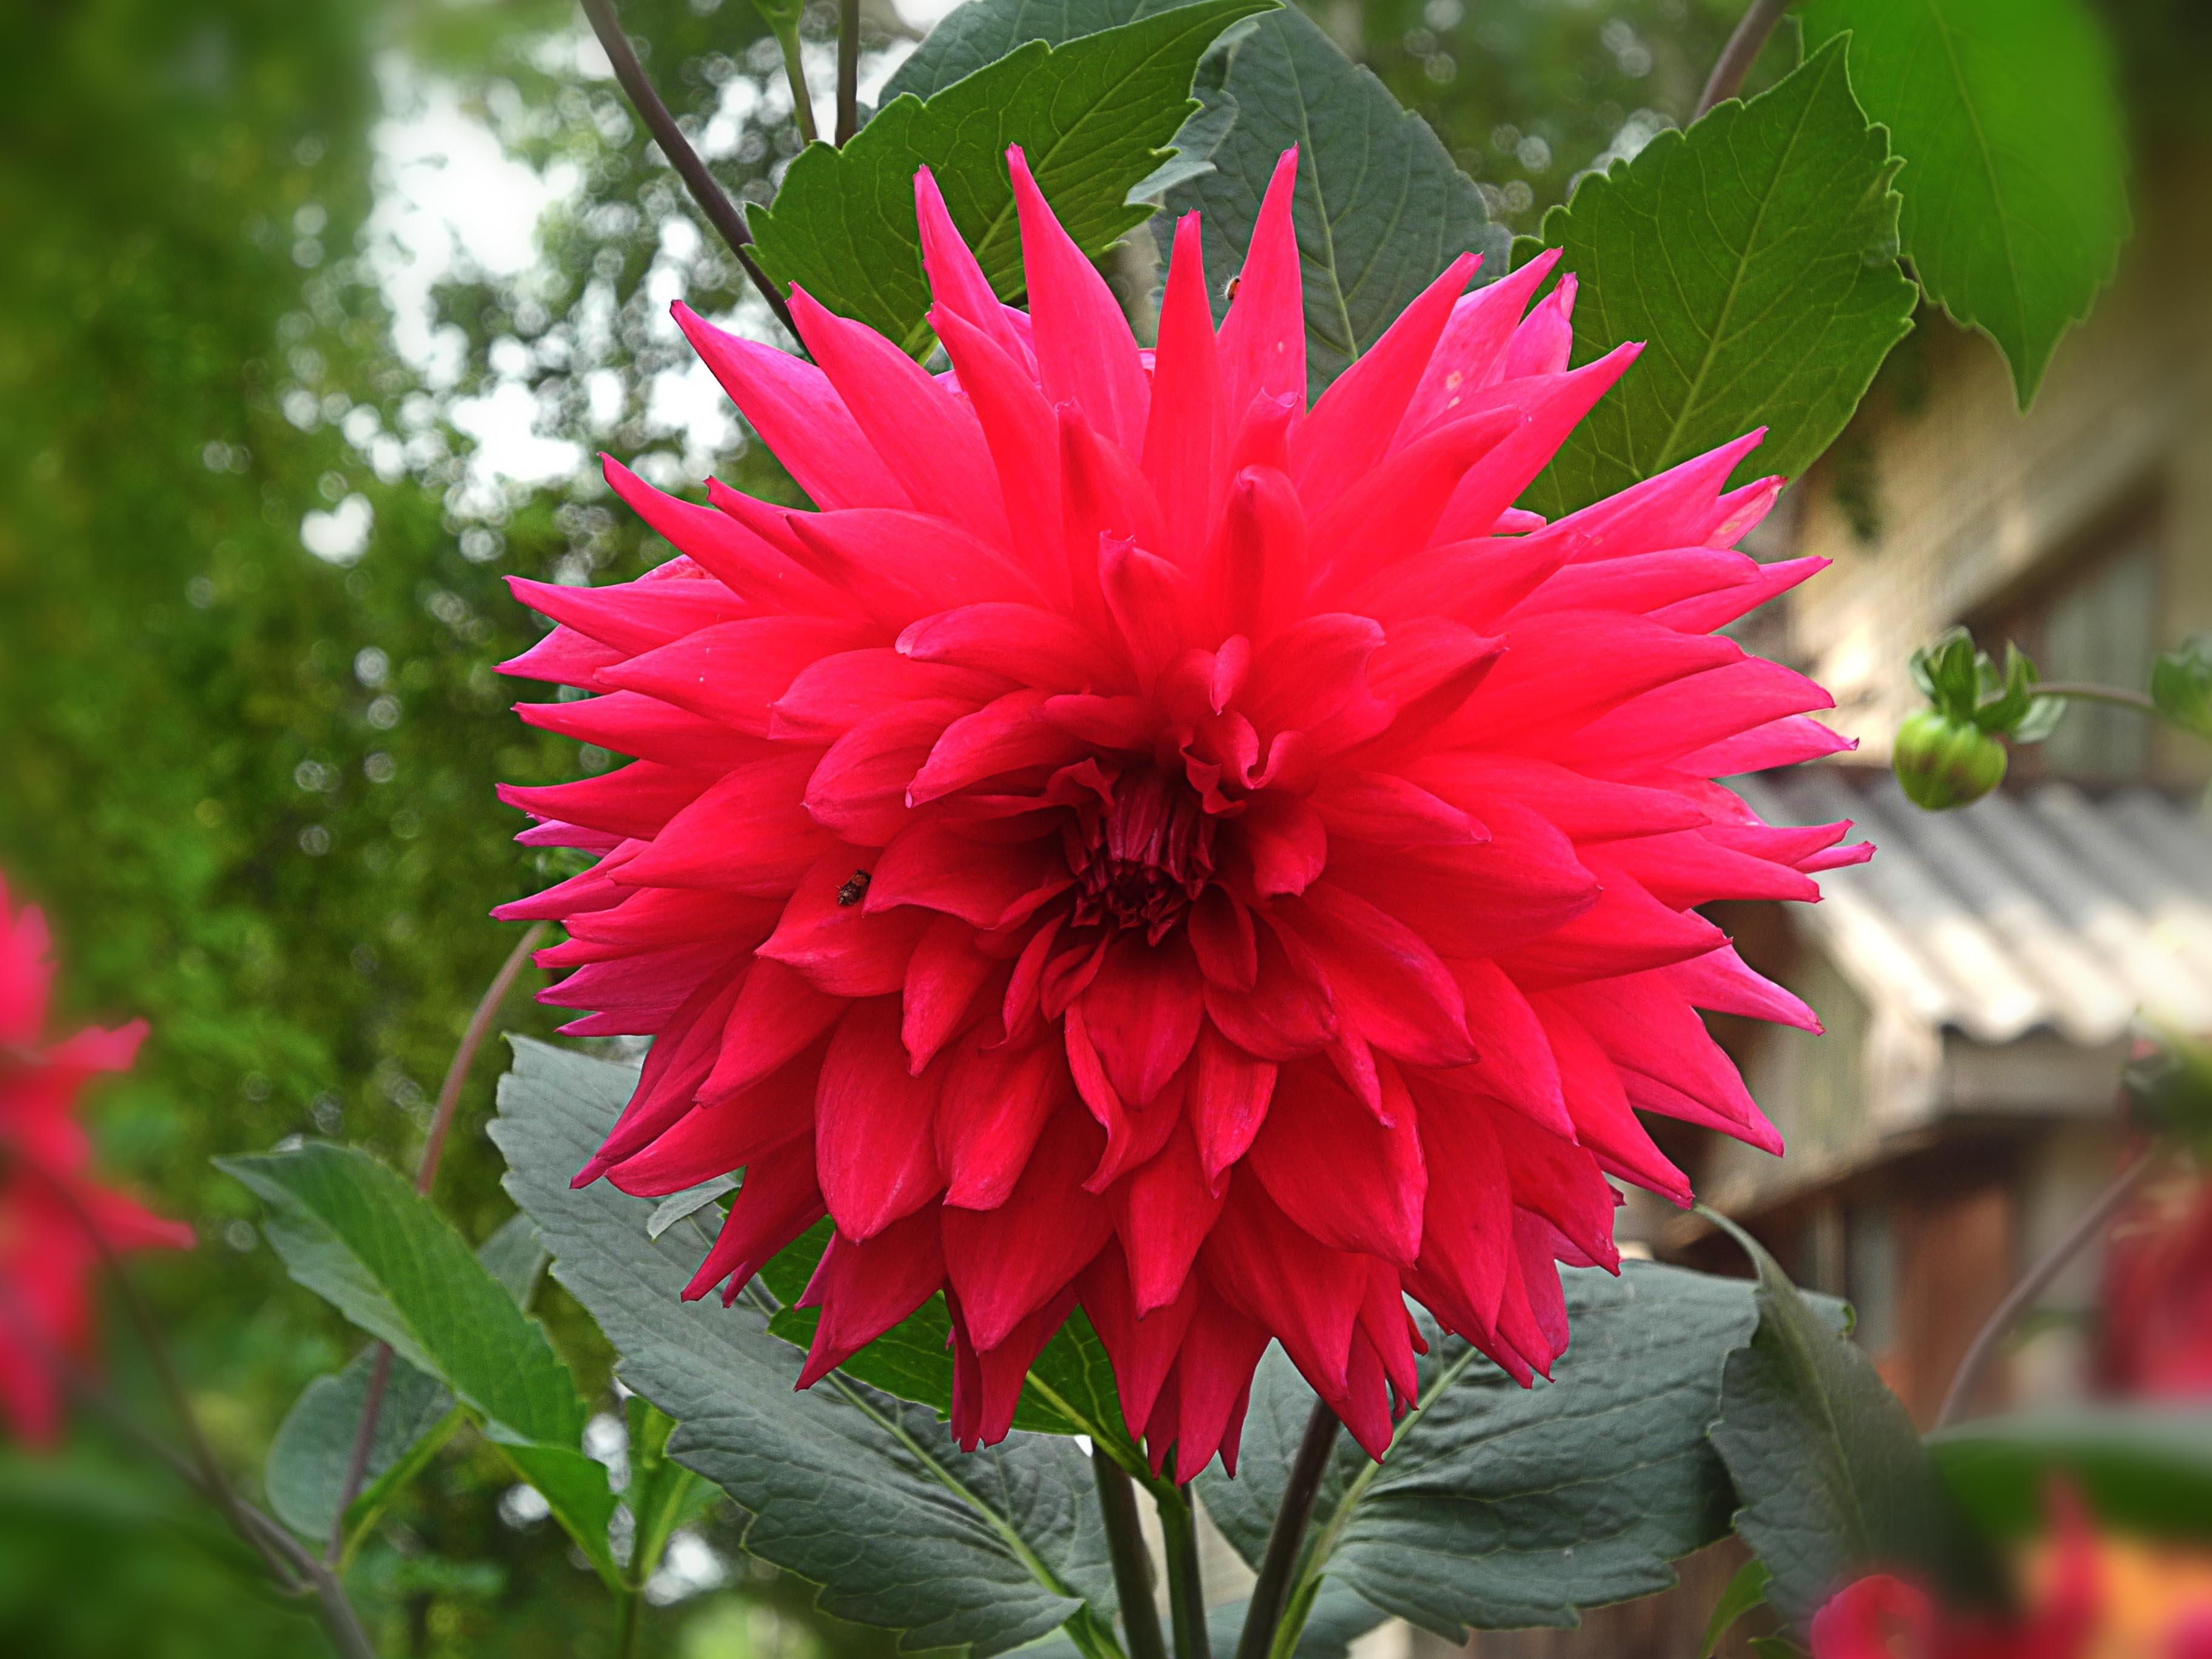 Free Images Nature Petal Red Botany Flora Dahlia Bright